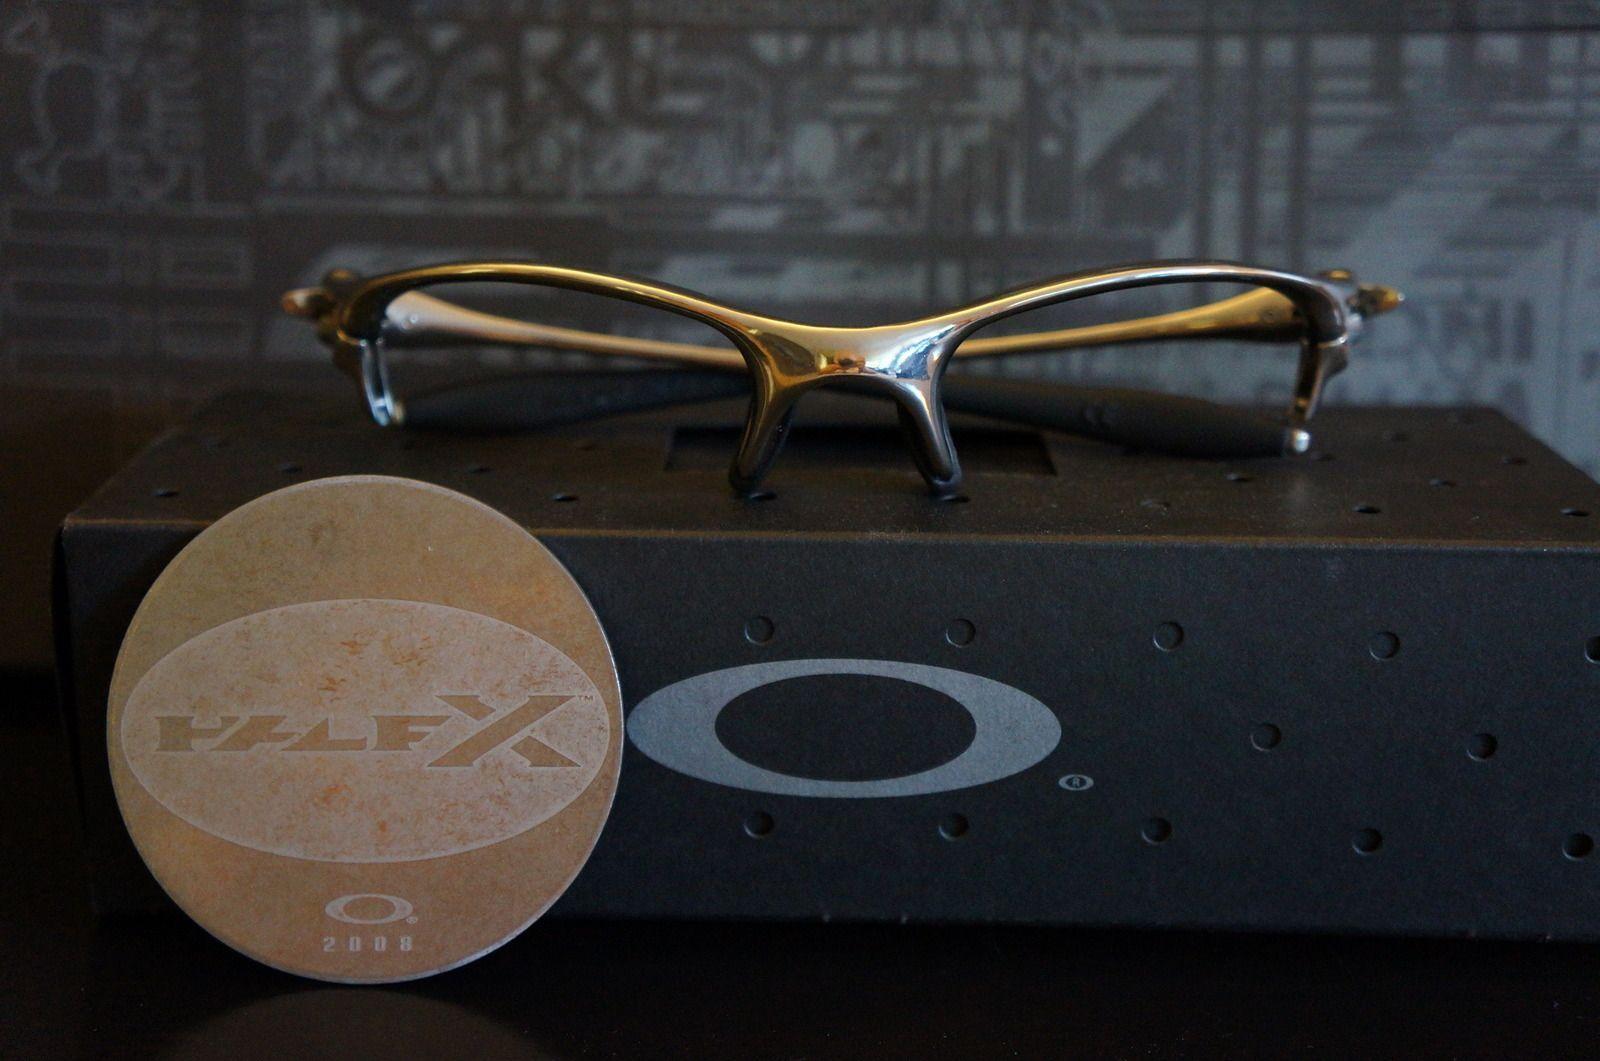 Polished Half-X Frame/Coin/Original Box - No Lens - dsc06512m.jpg